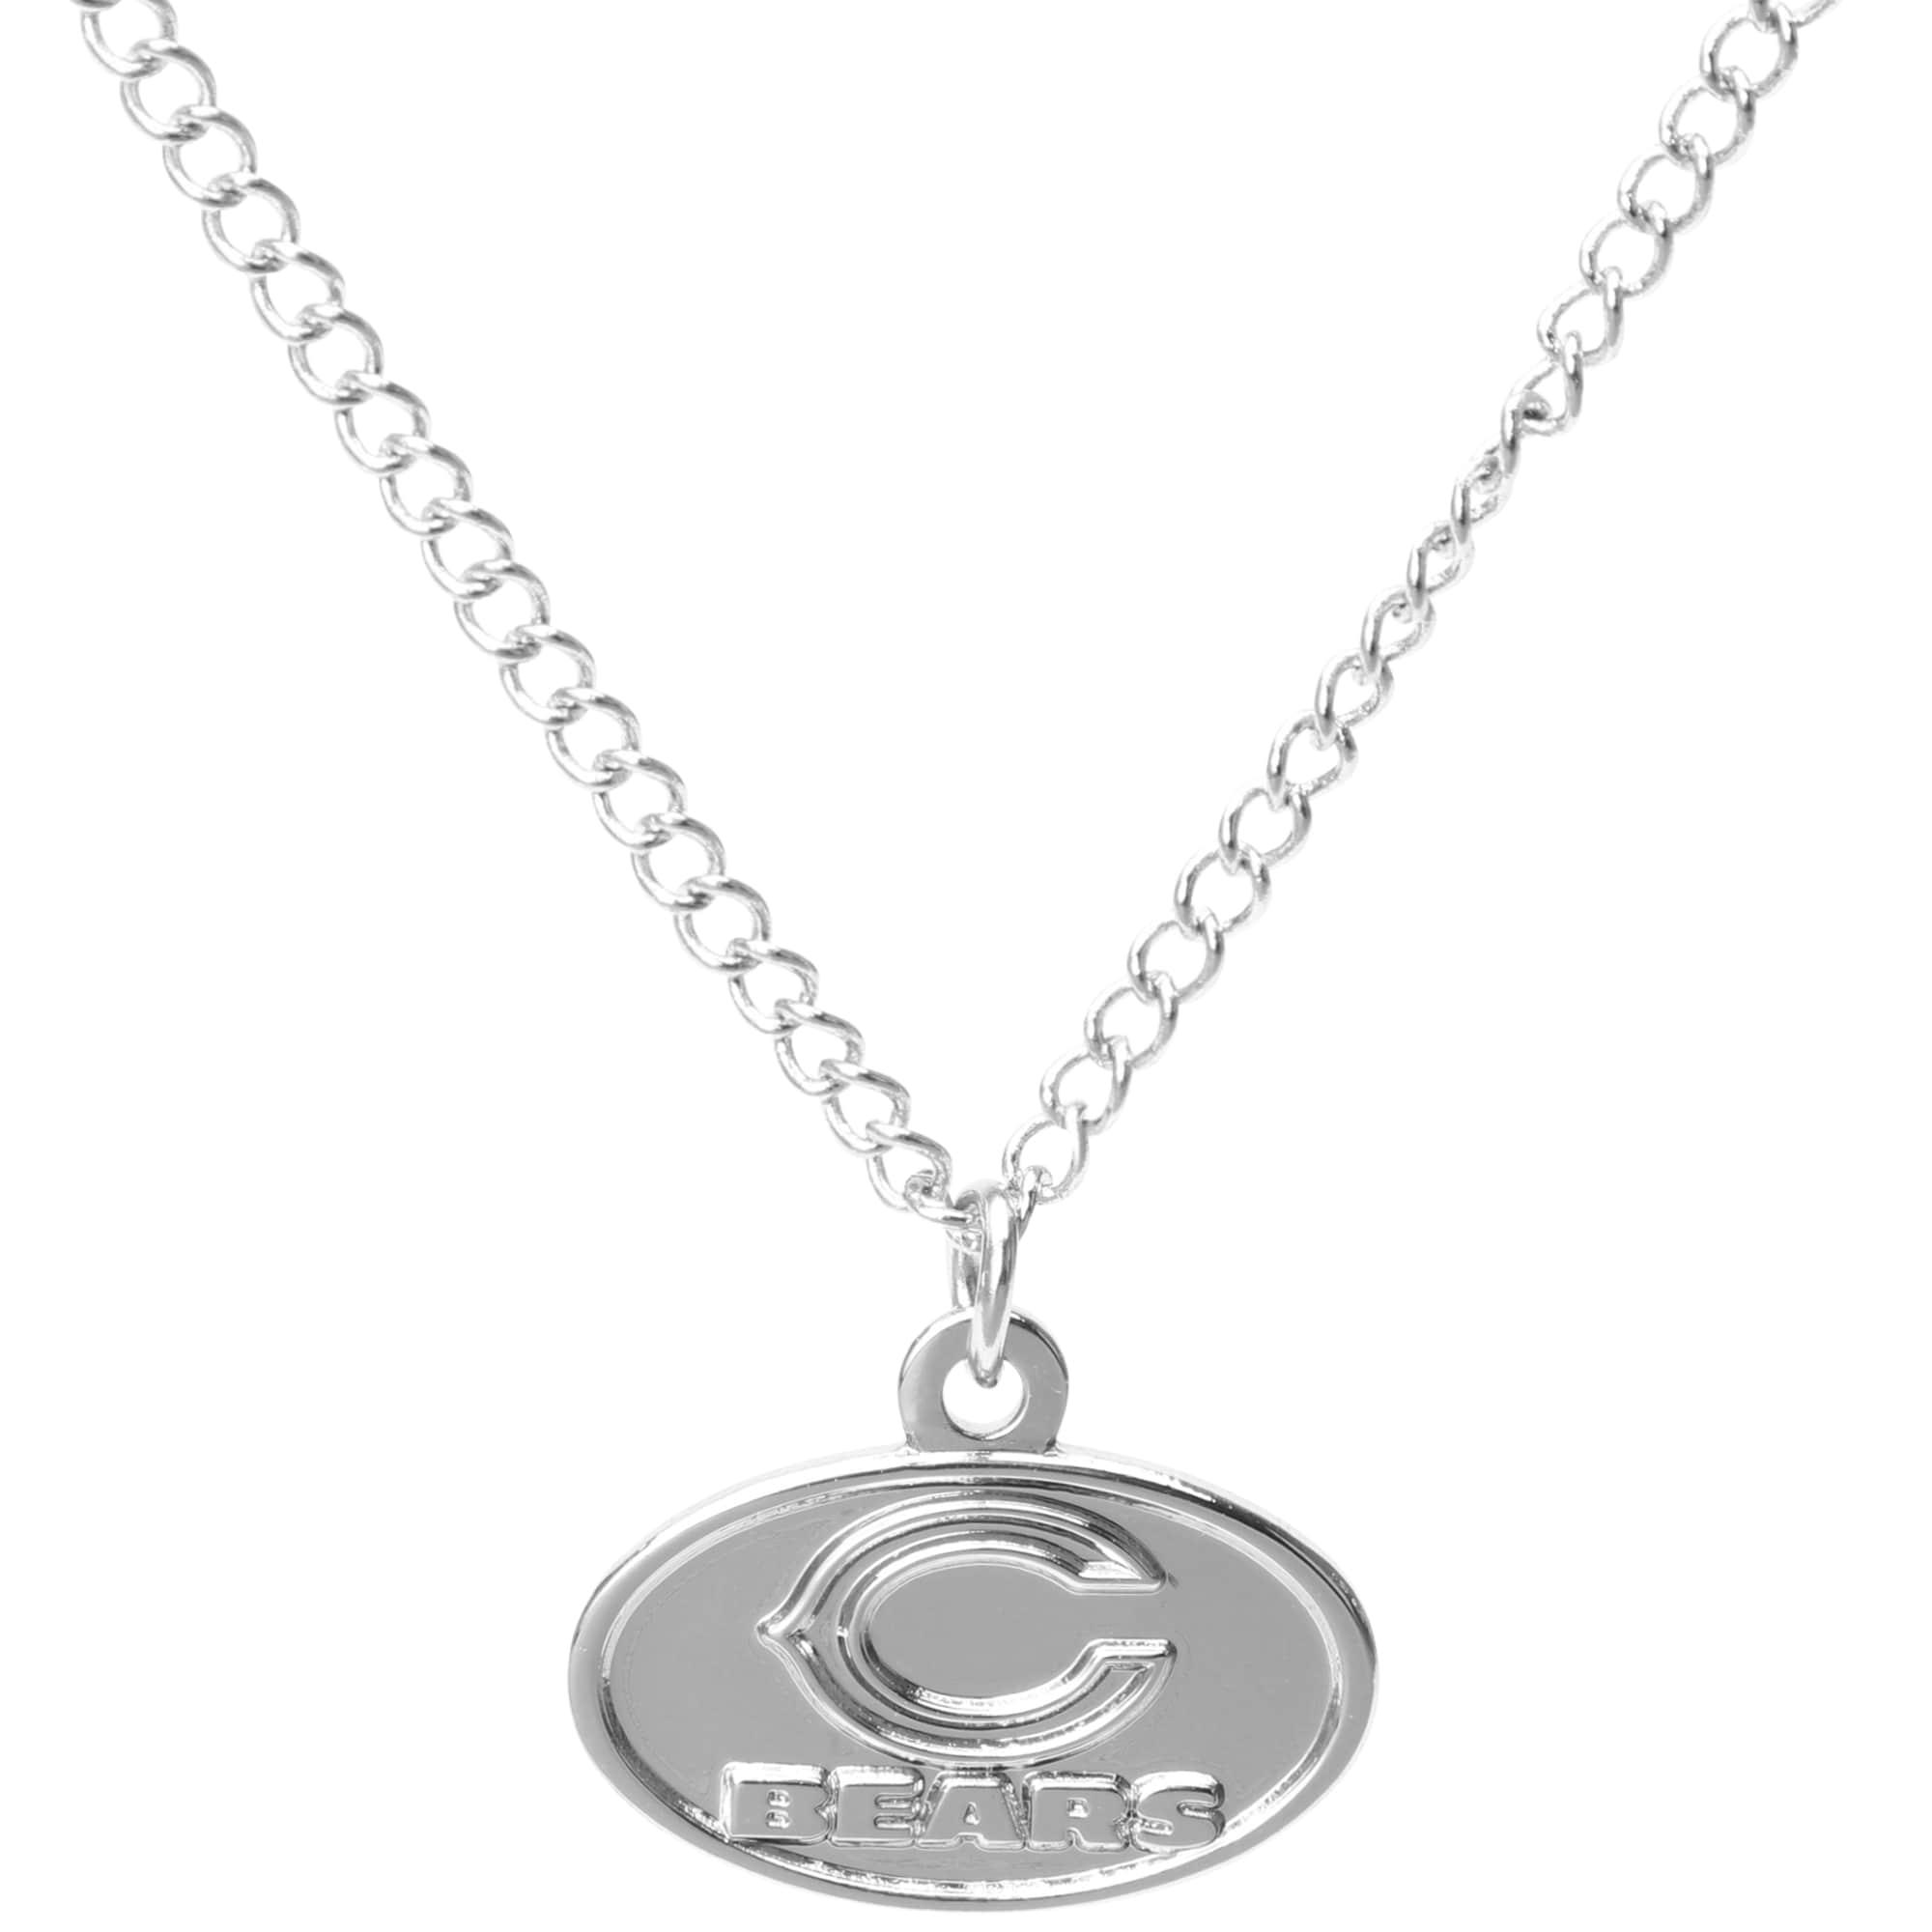 Chicago Bears WinCraft Women's Logo Necklace - Silver